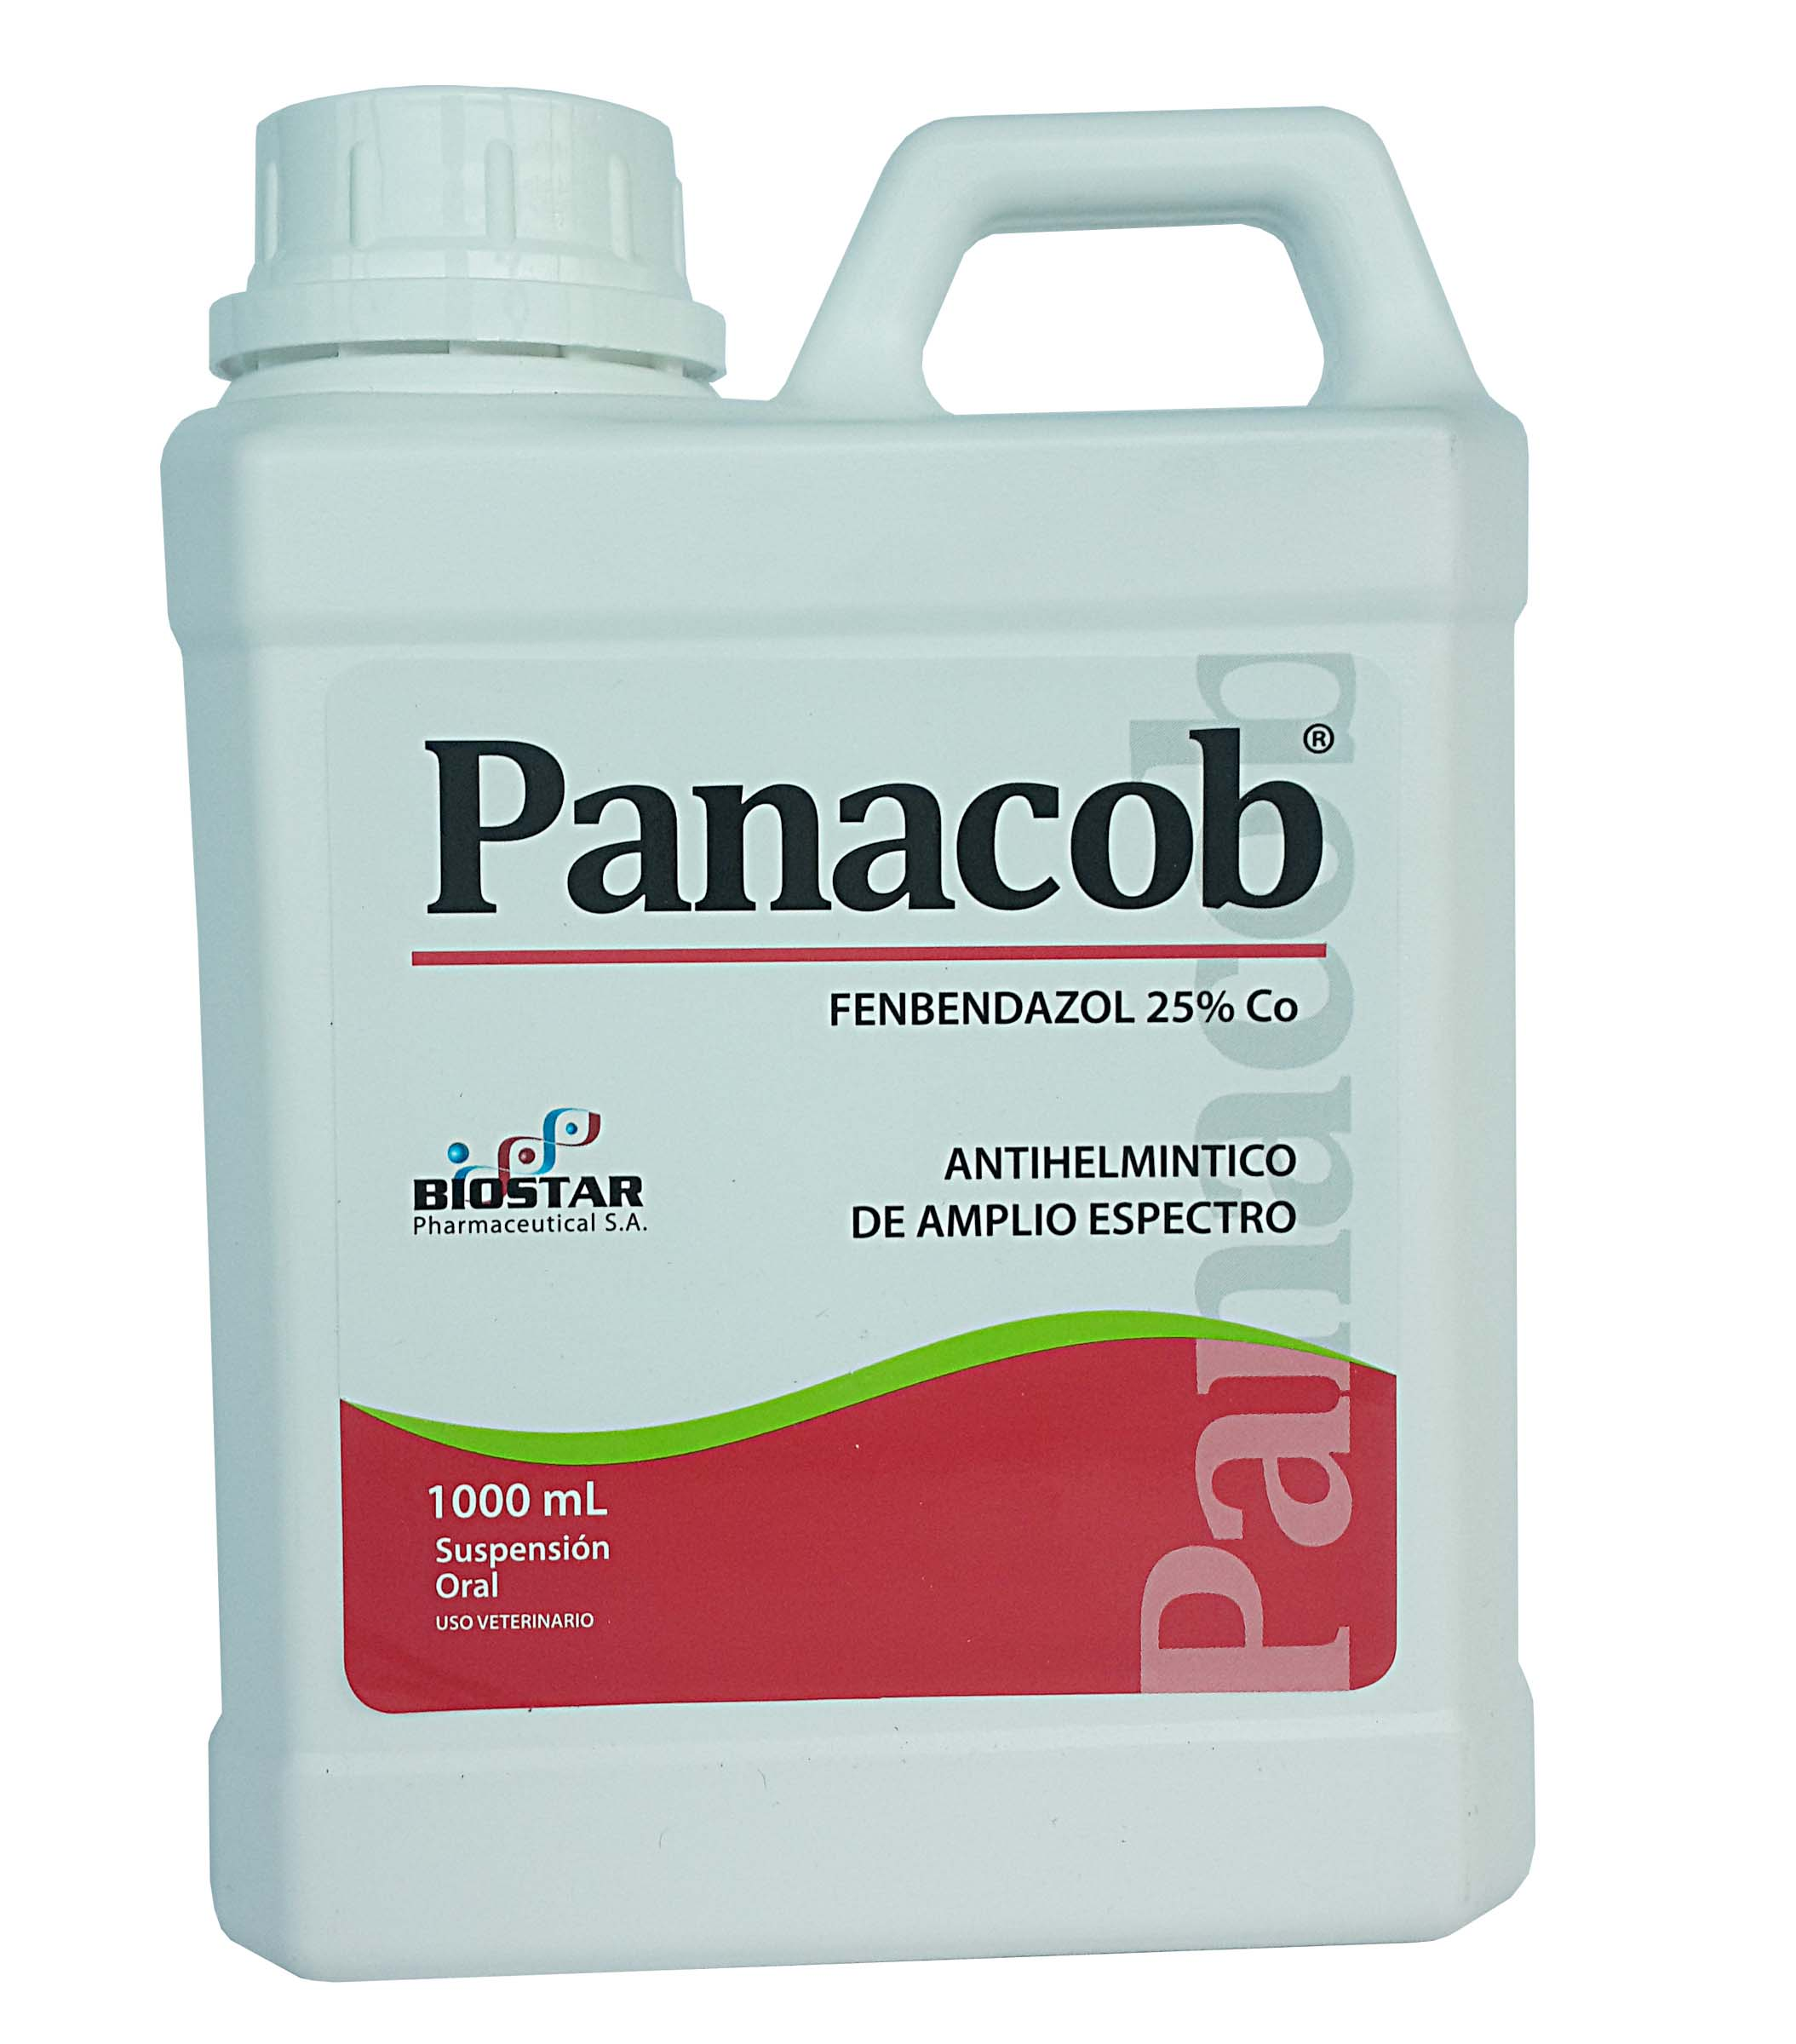 Panacob 25% Co